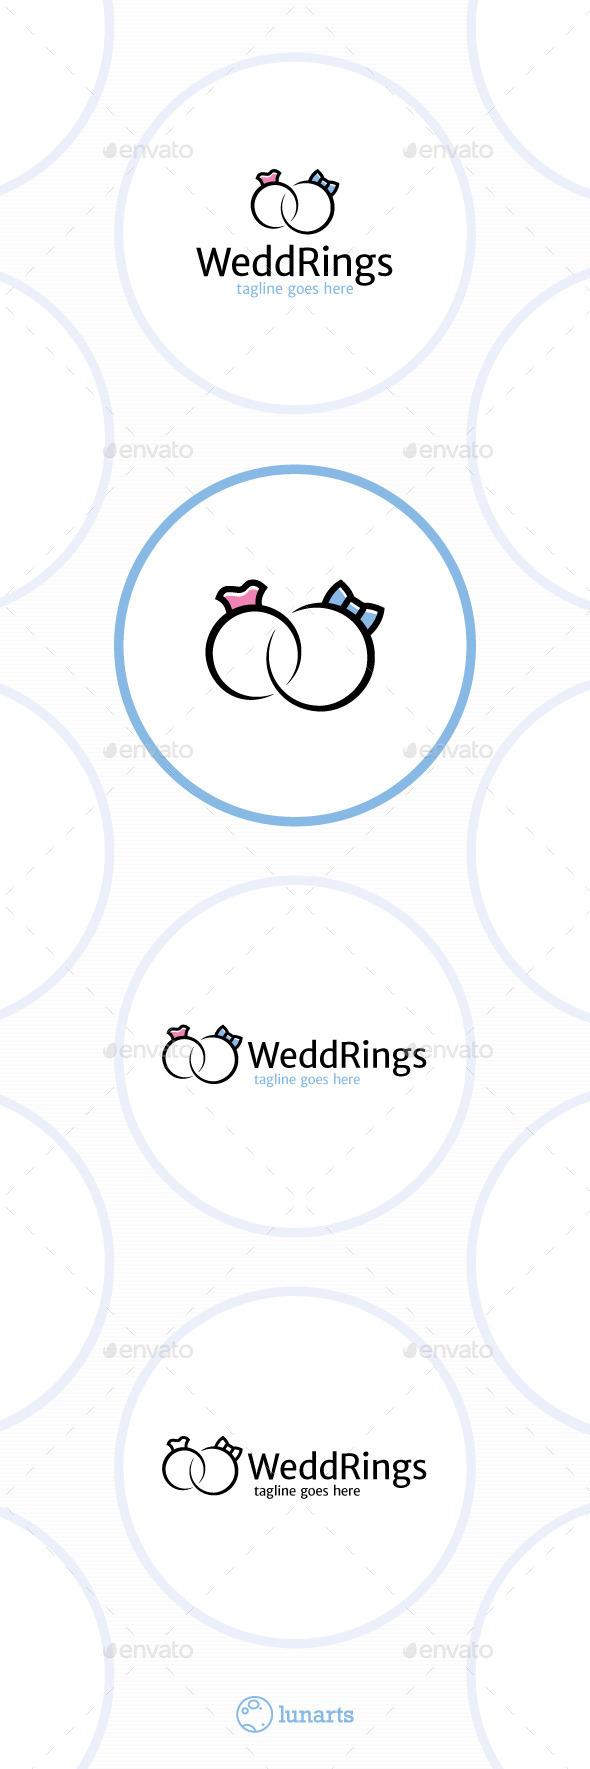 Wedding Rings Logo - Male and Female